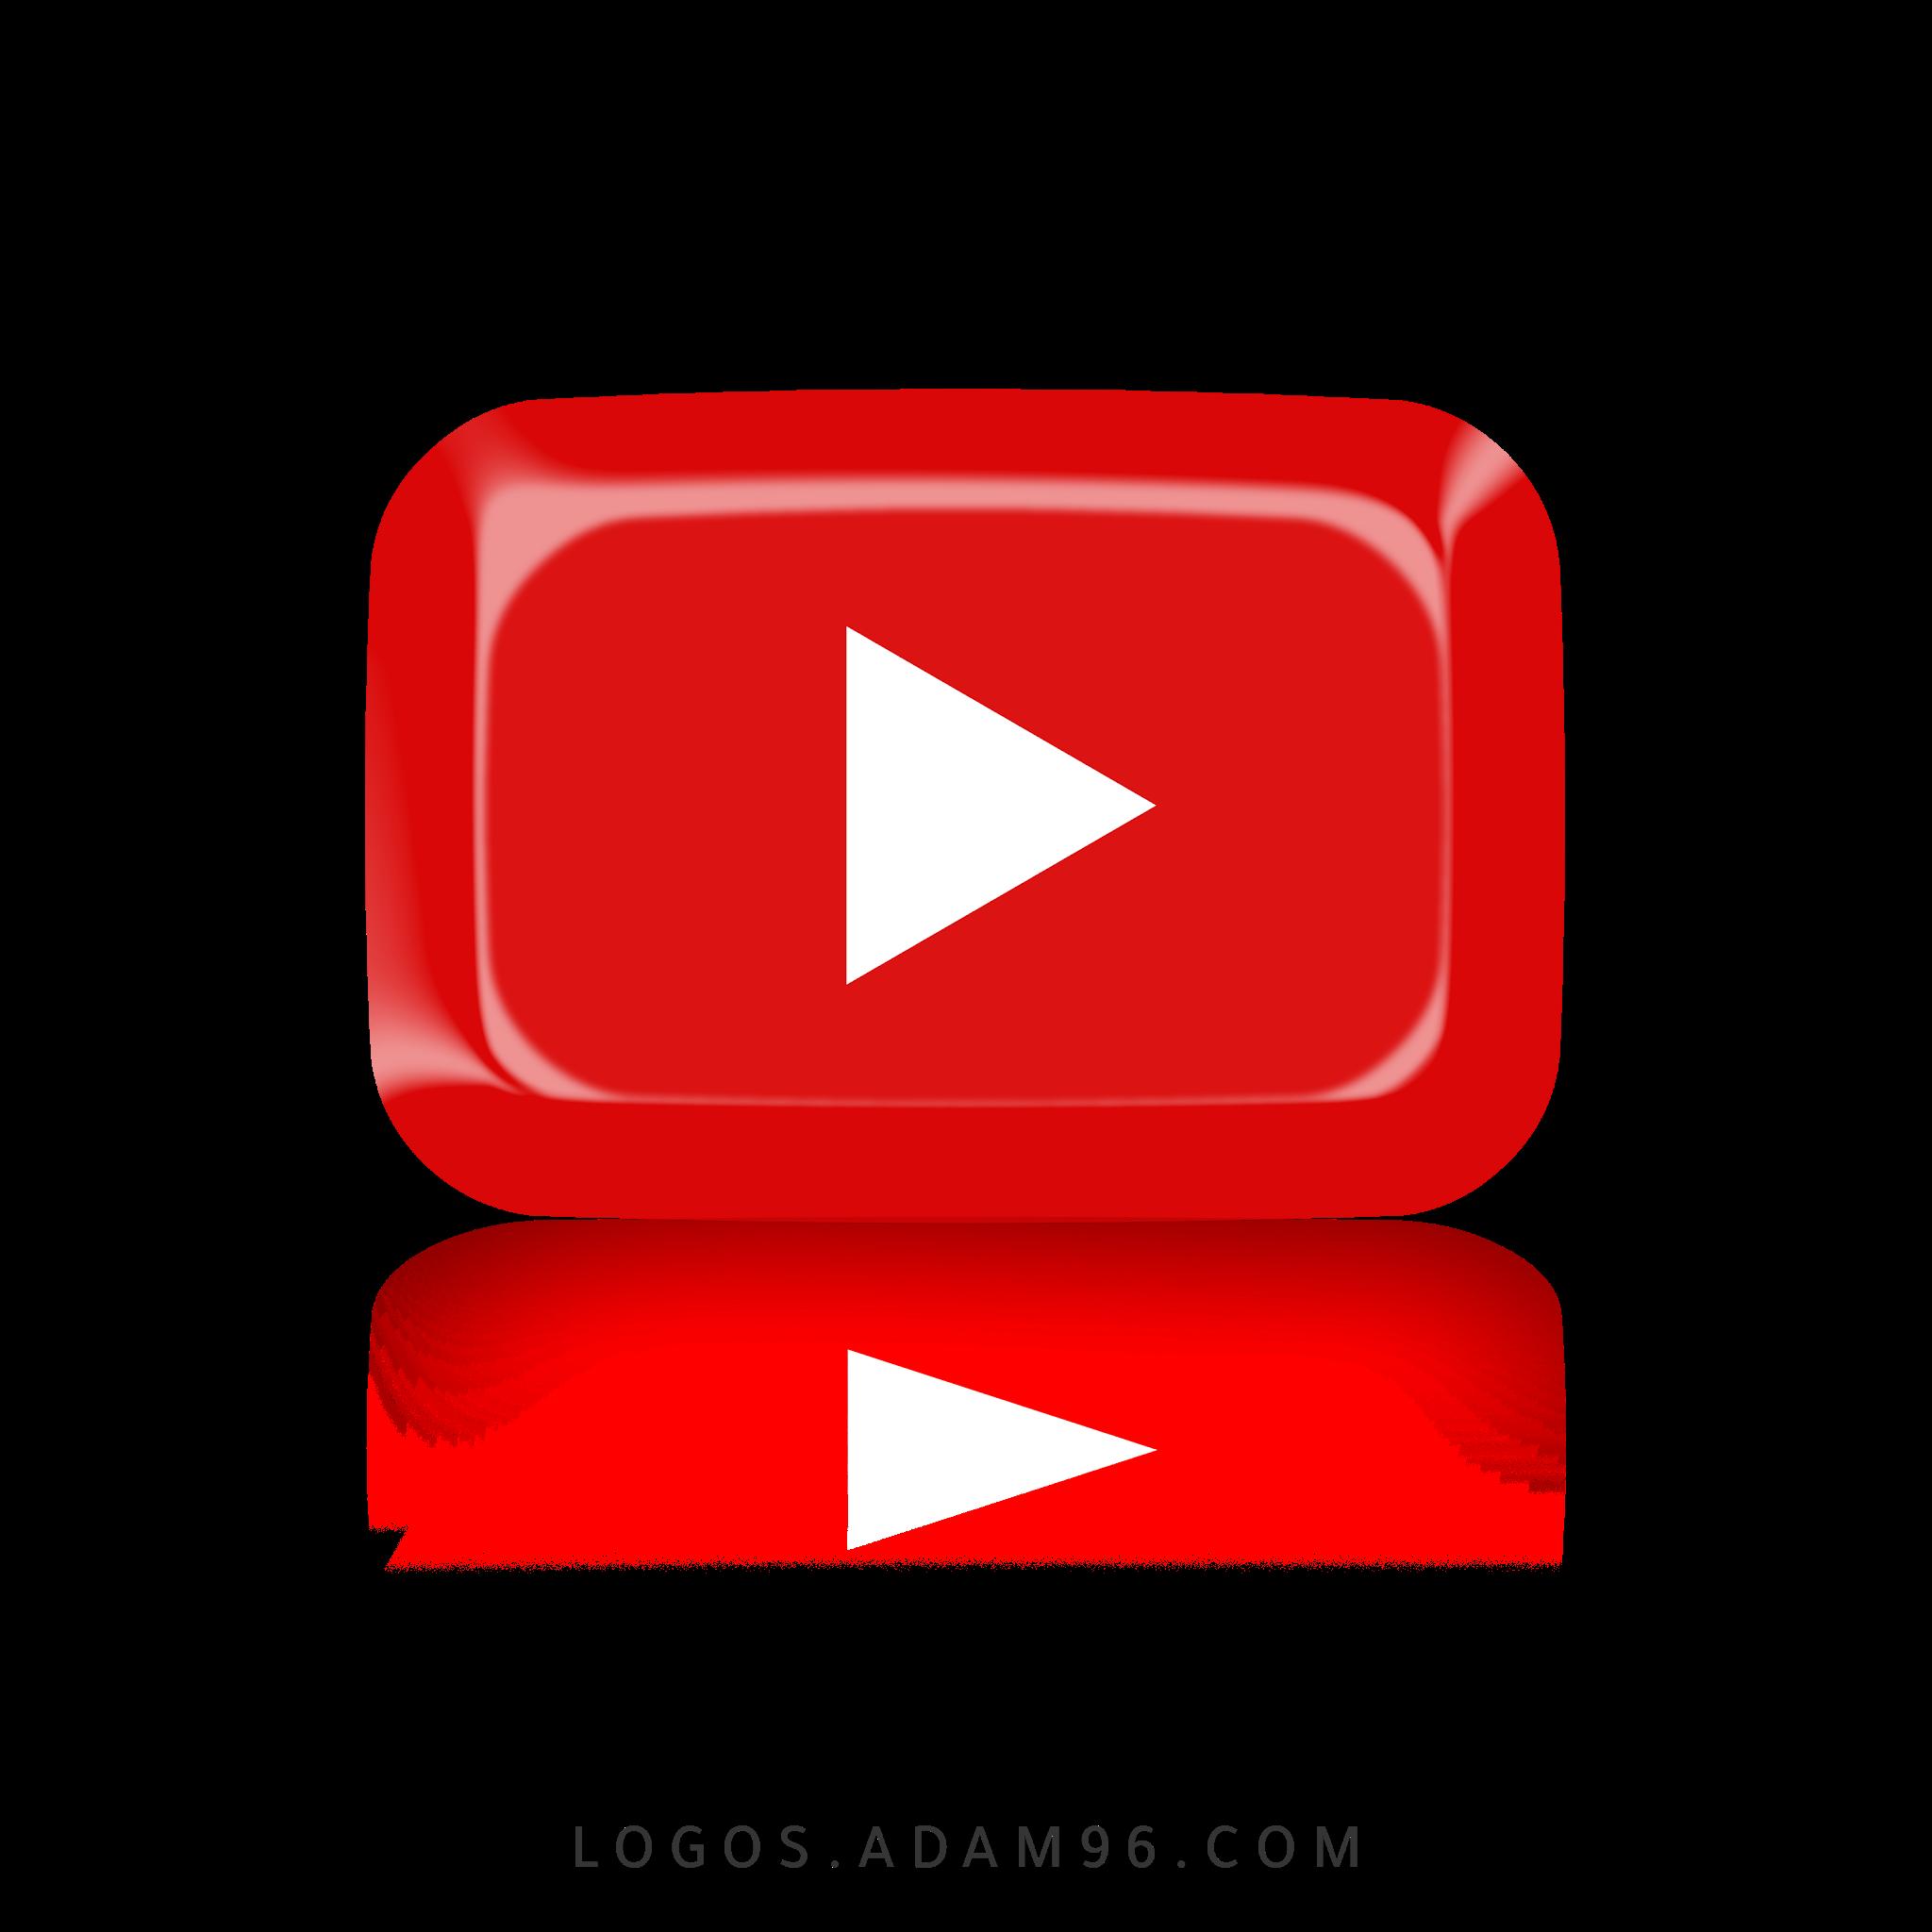 YouTube Red Logo PNG Download Original Logo Big Size ...